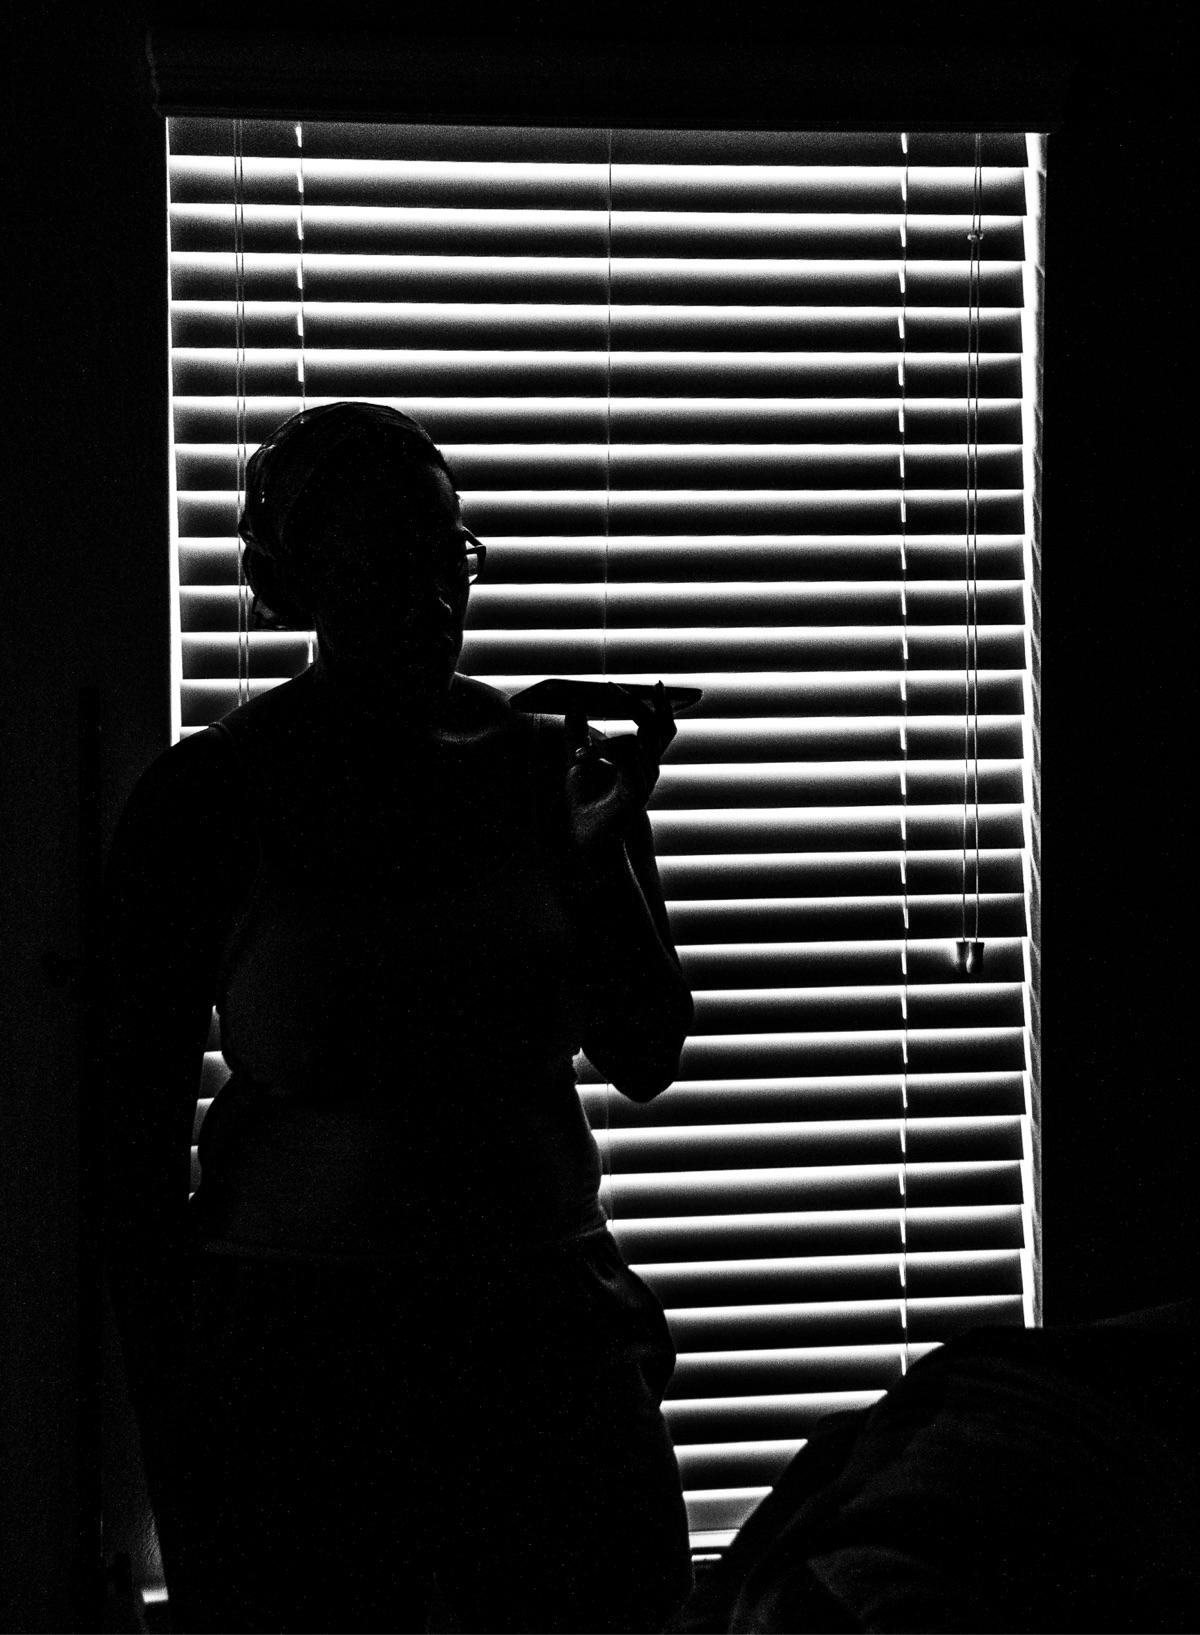 blackandwhitephotography, silhouette - thephotog | ello